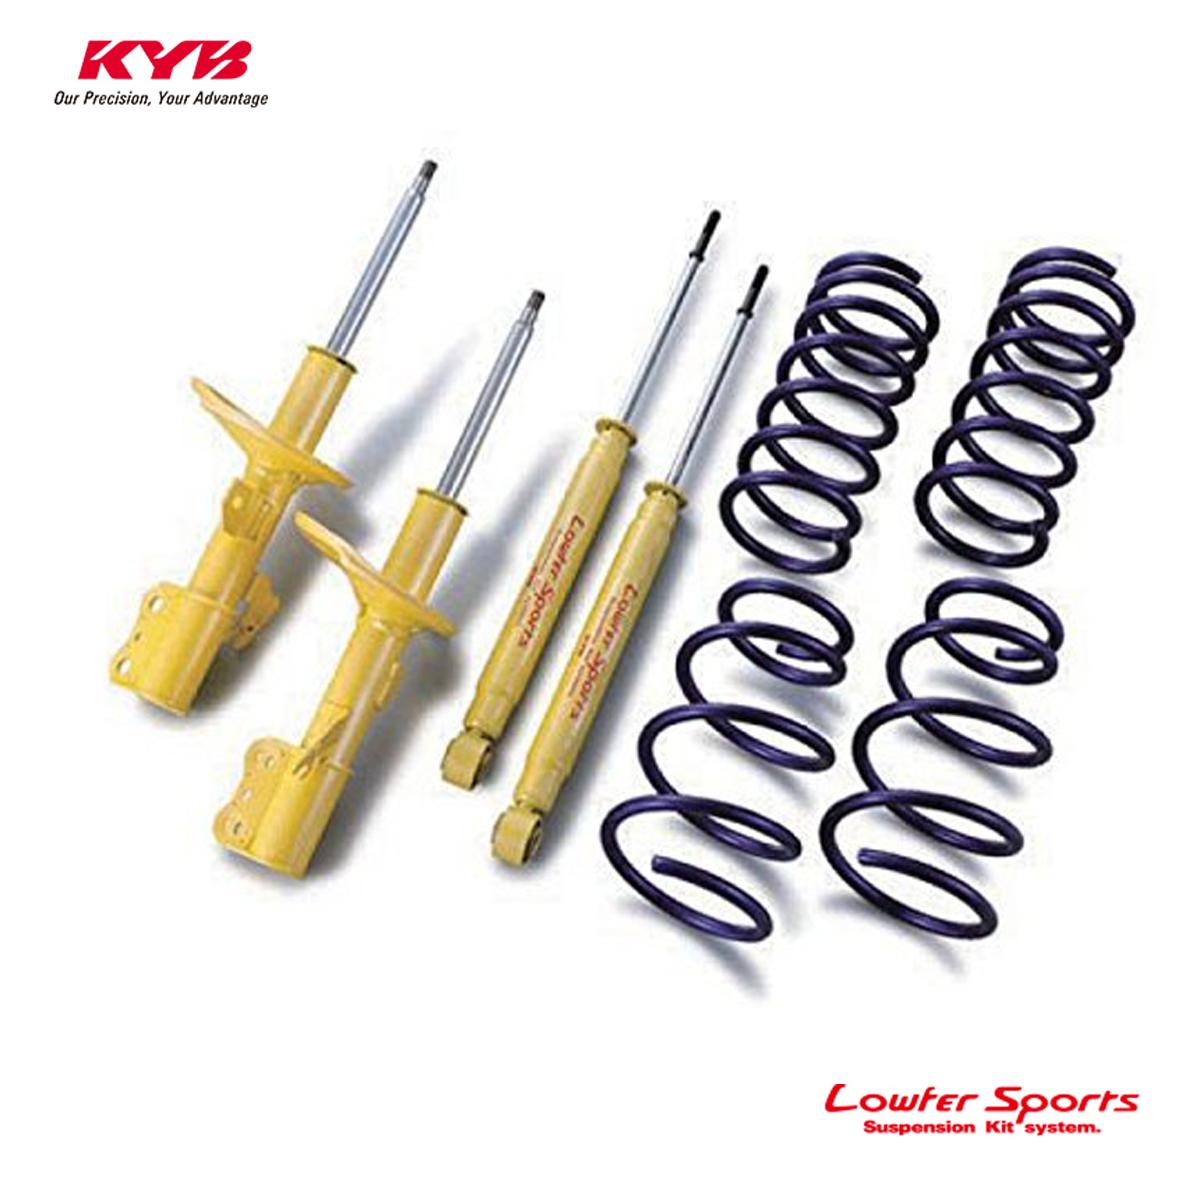 KYB カヤバ タントエグゼ L455S ショックアブソーバー サスペンションキット Lowfer Sports LKIT-L455SRS 配送先条件有り